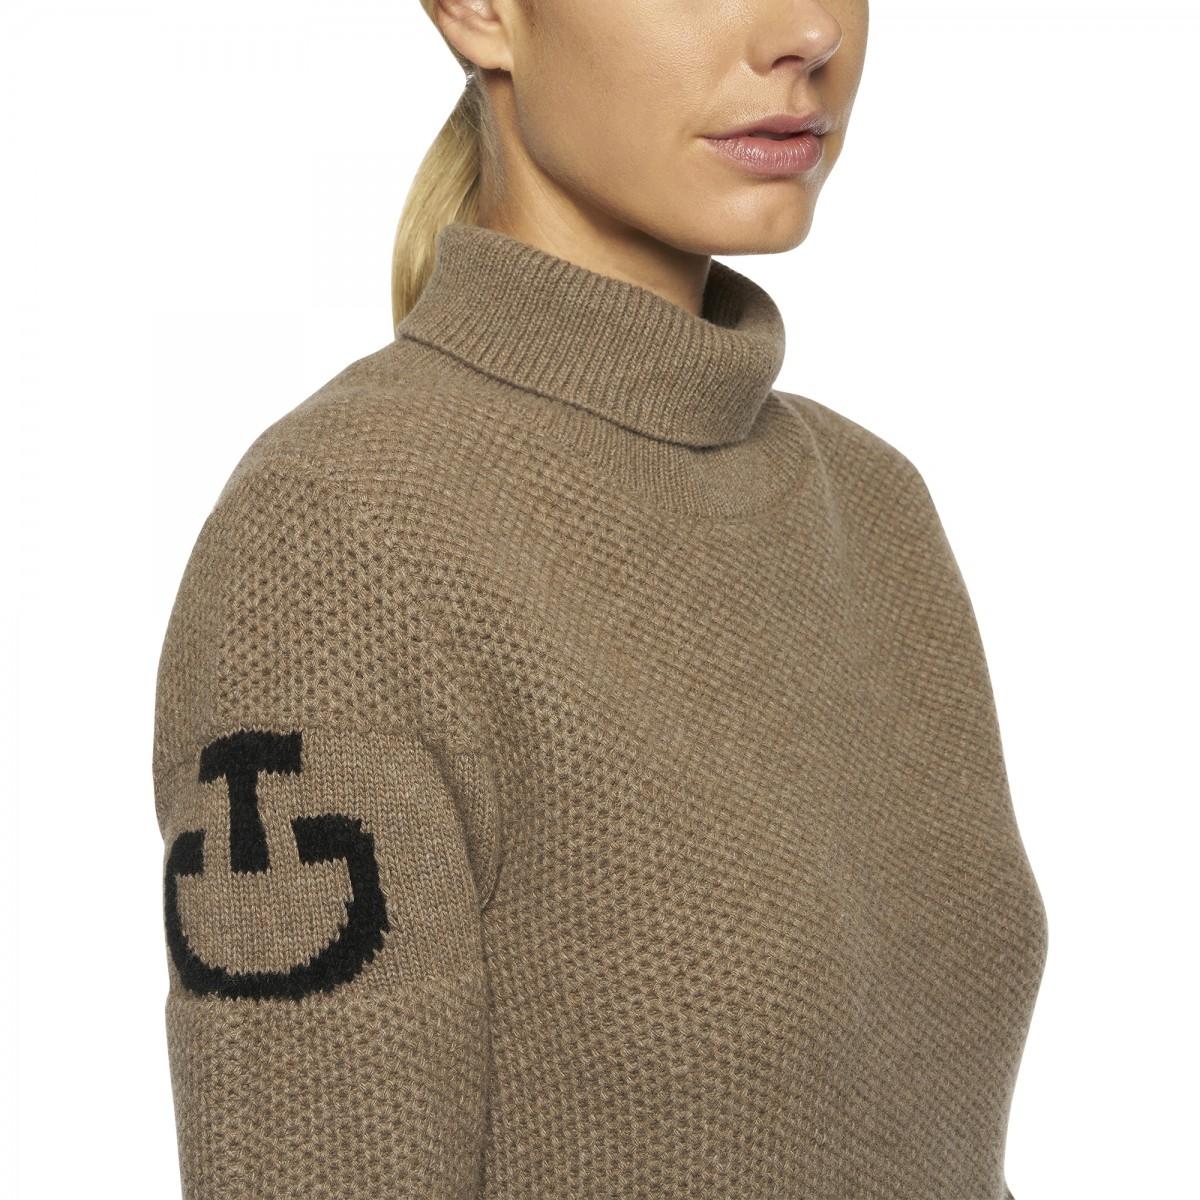 Cavalleria Toacana Eco Merinos Tutleneck Double Knit Sweater Beige